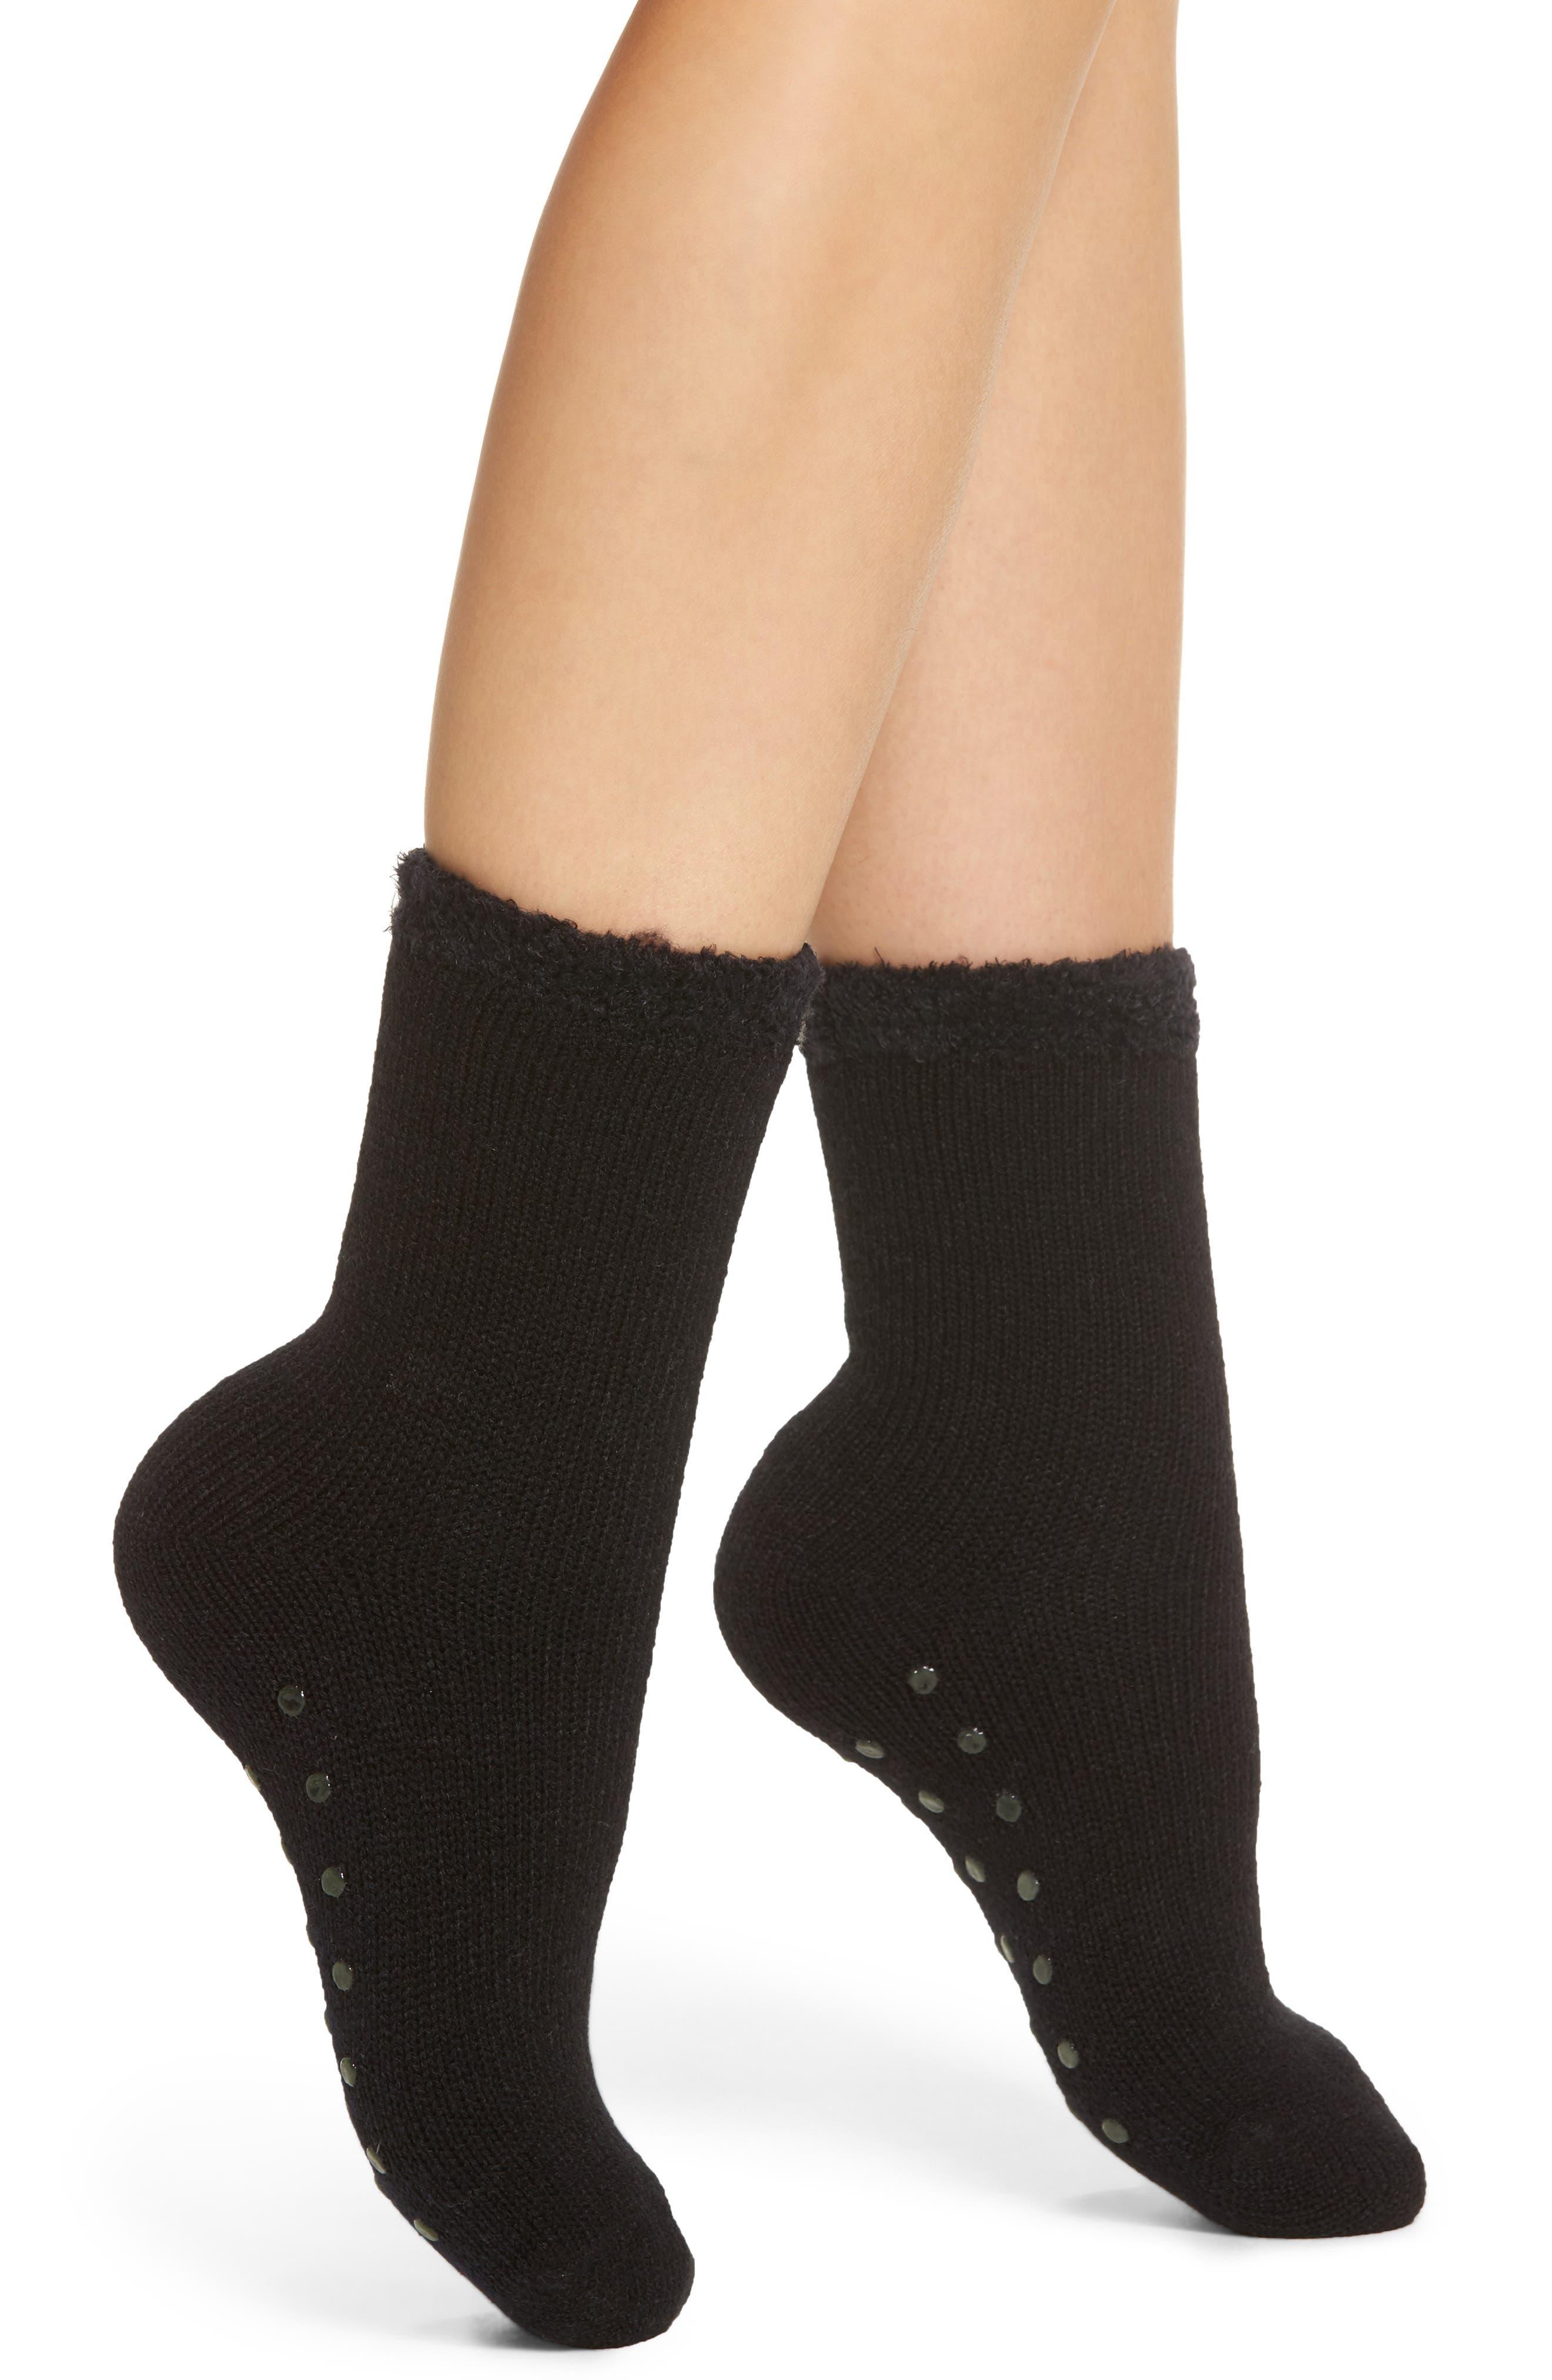 Butter Cuff Socks,                         Main,                         color, Black